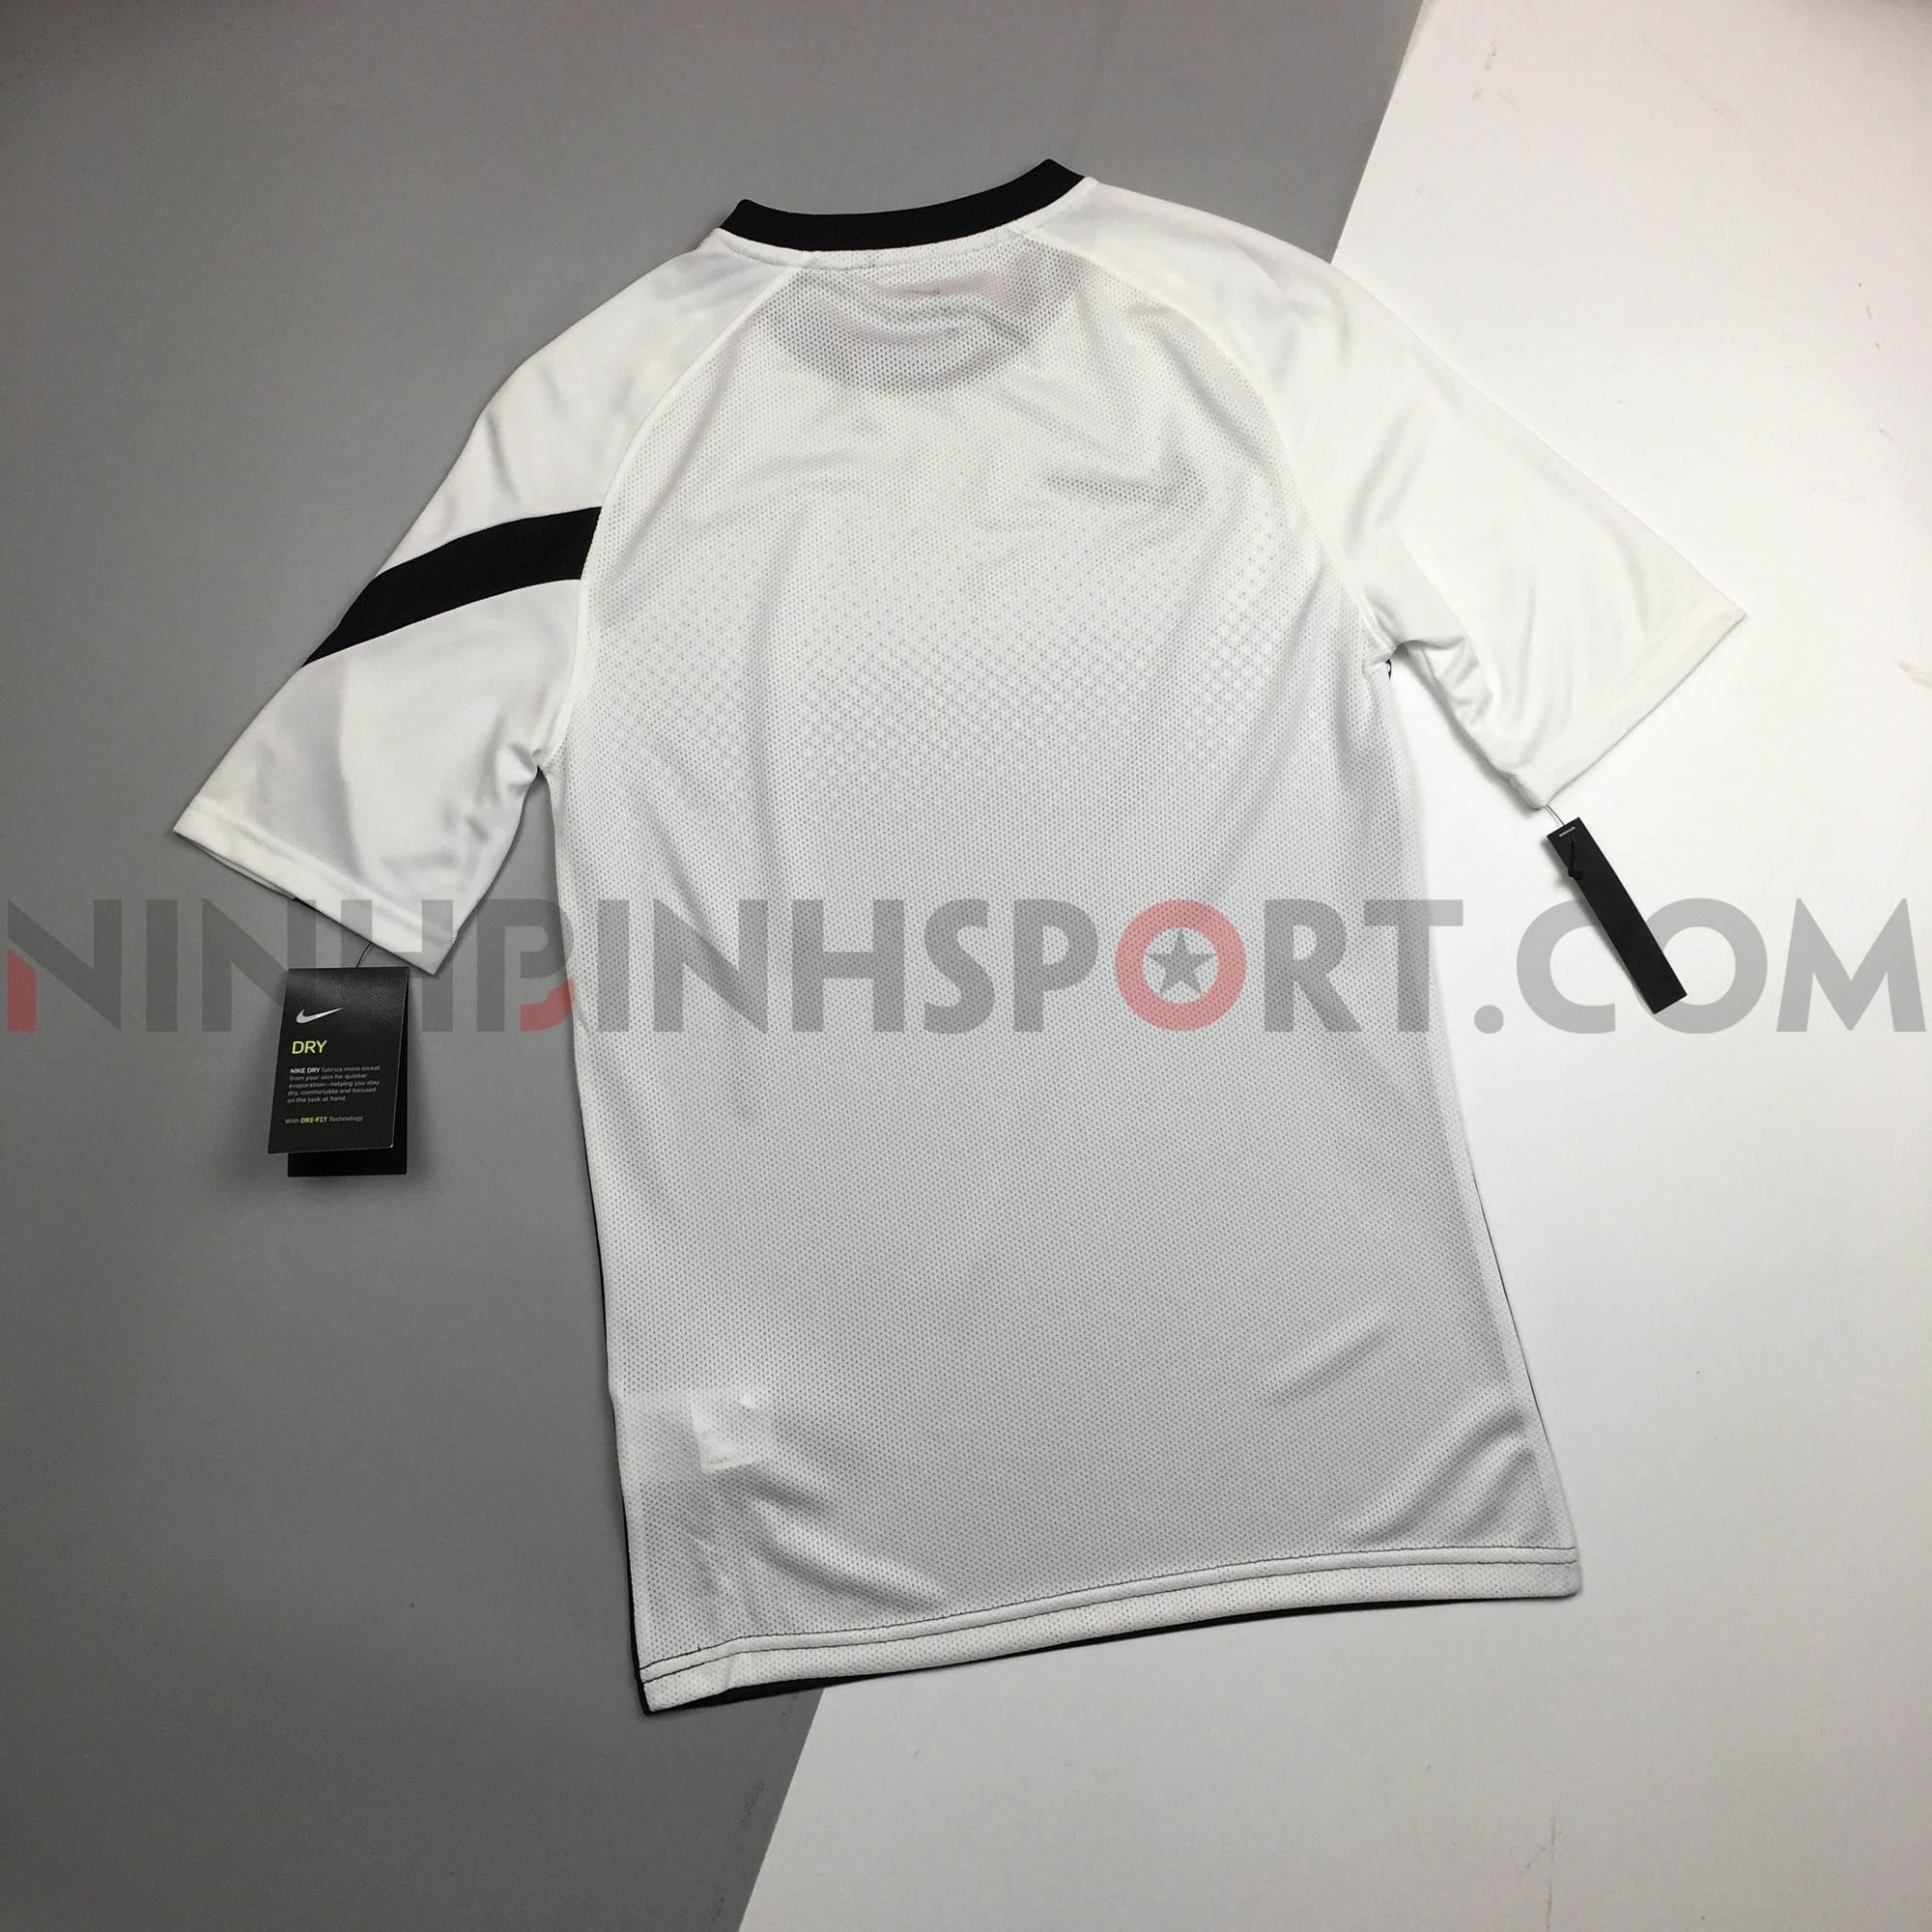 Áo thể thao nam Nike ACD GX FP White CJ9917-100